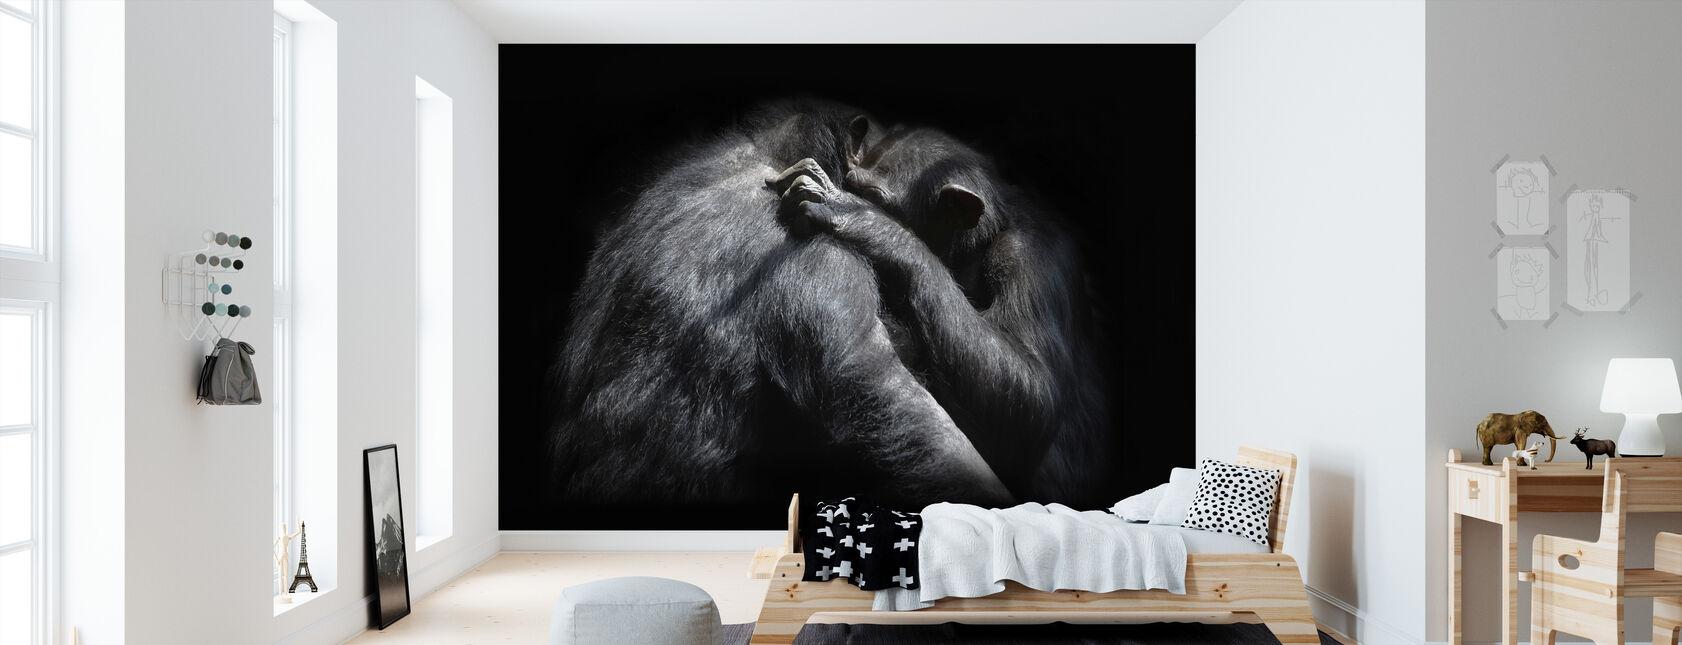 Embrace - Wallpaper - Kids Room